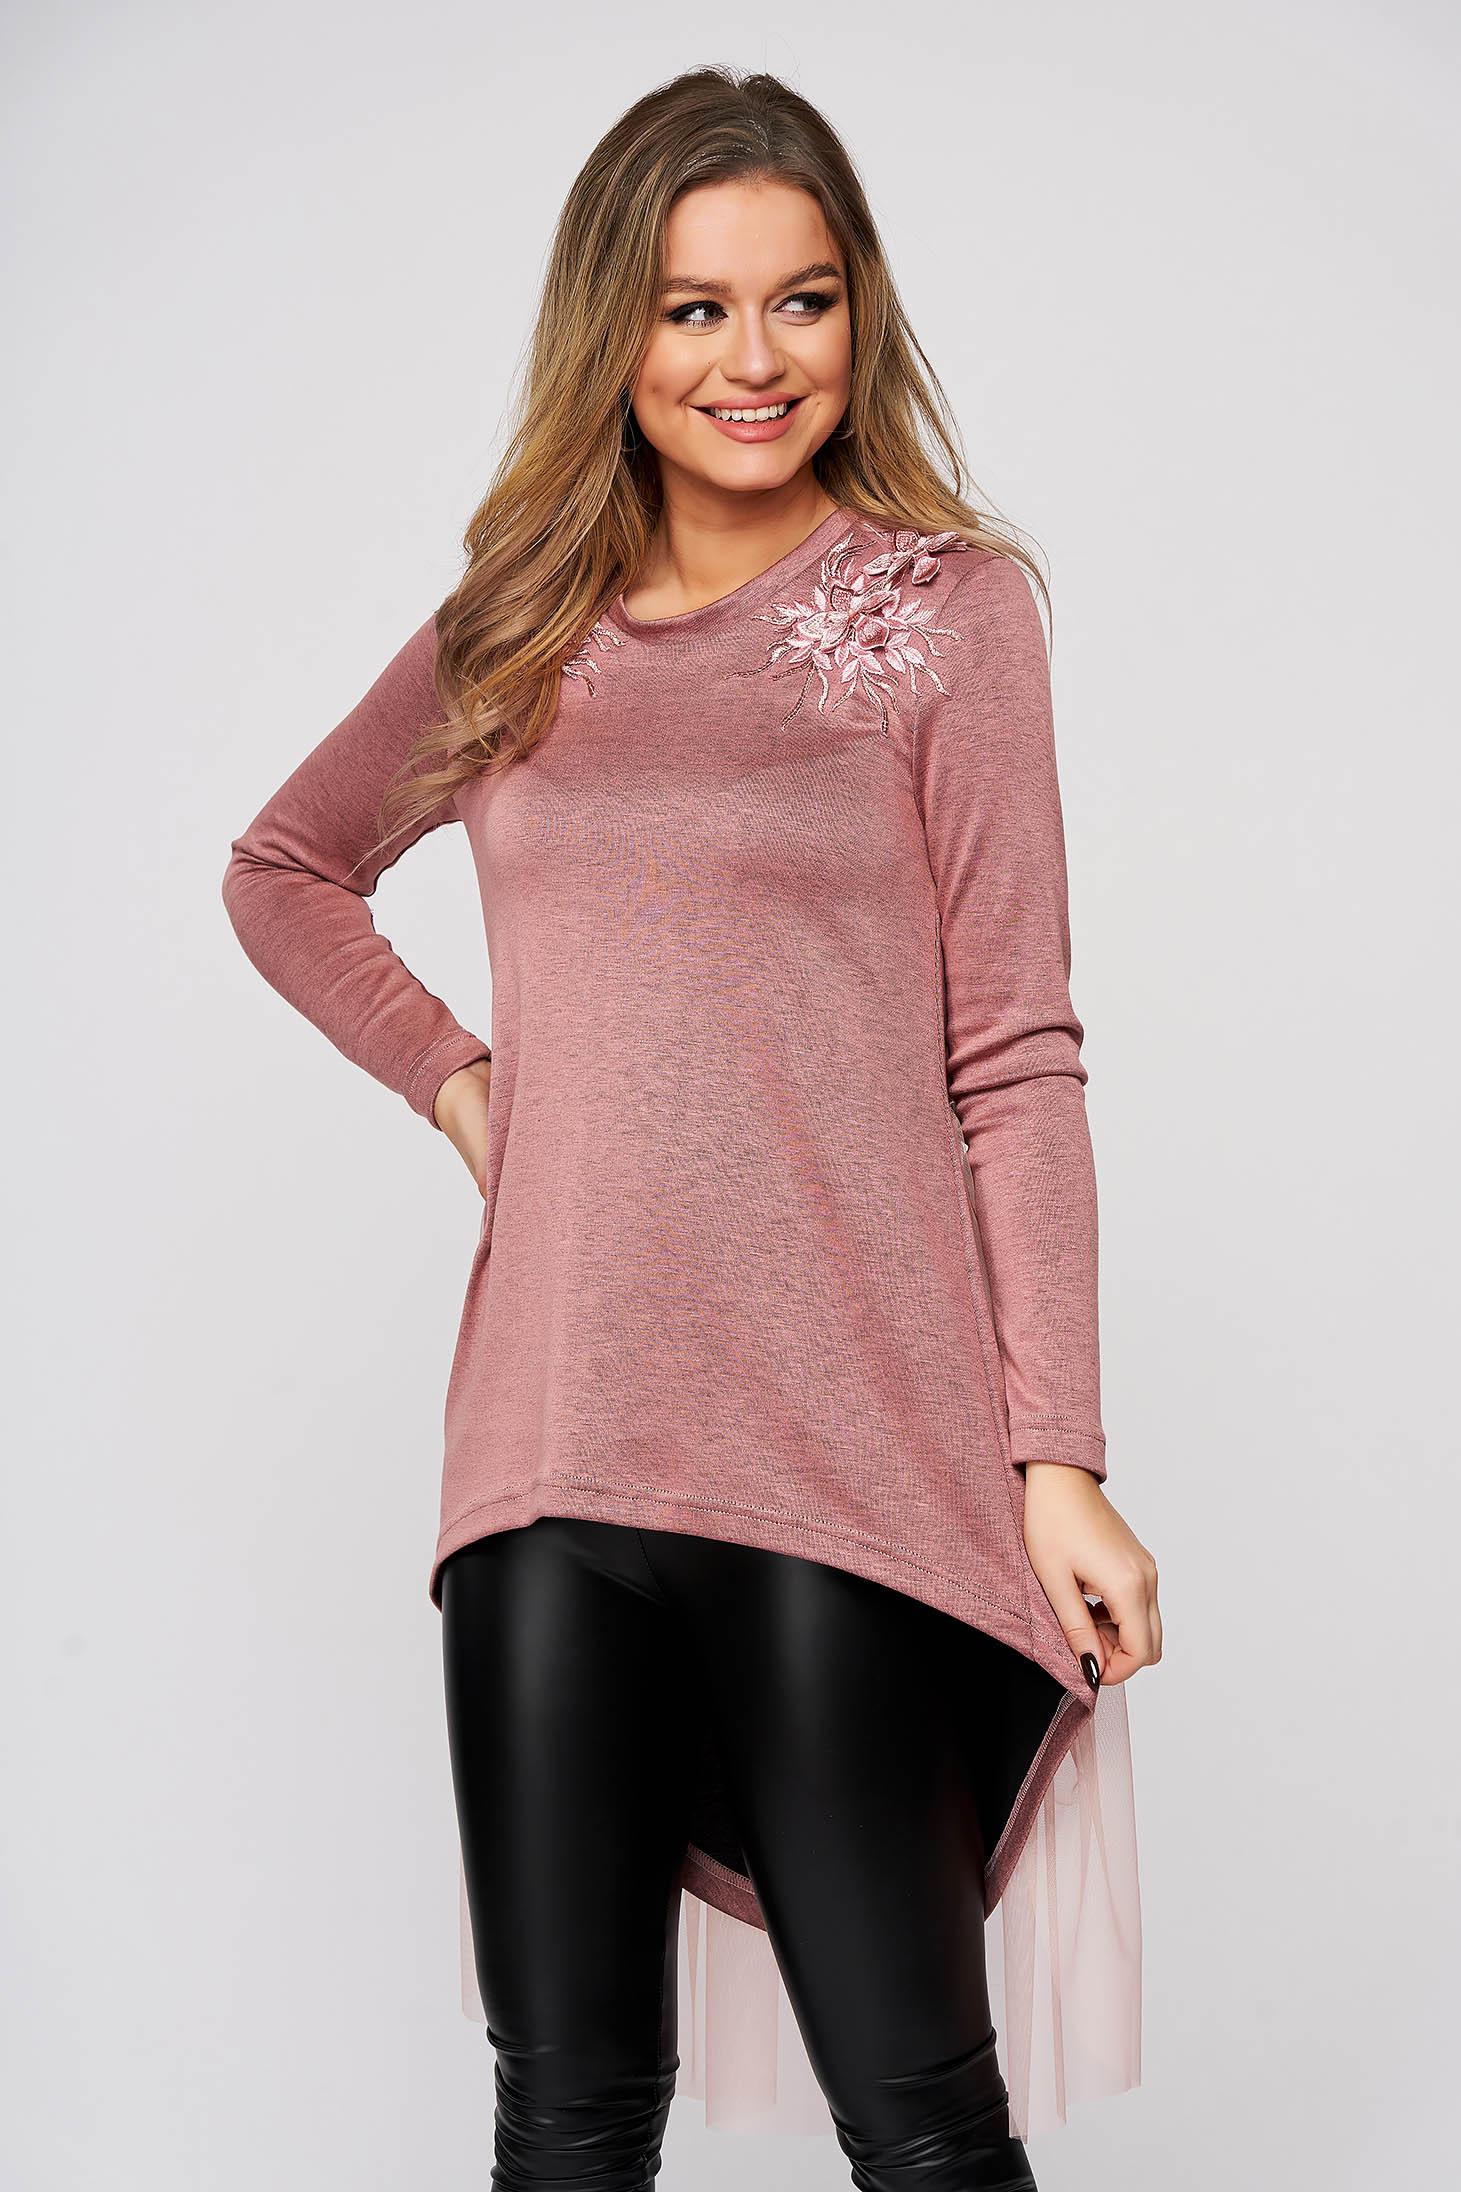 Bluza dama roz prafuit StarShinerS asimetrica cu croi larg cu aplicatii de tul cu aplicatii cu pietre strass